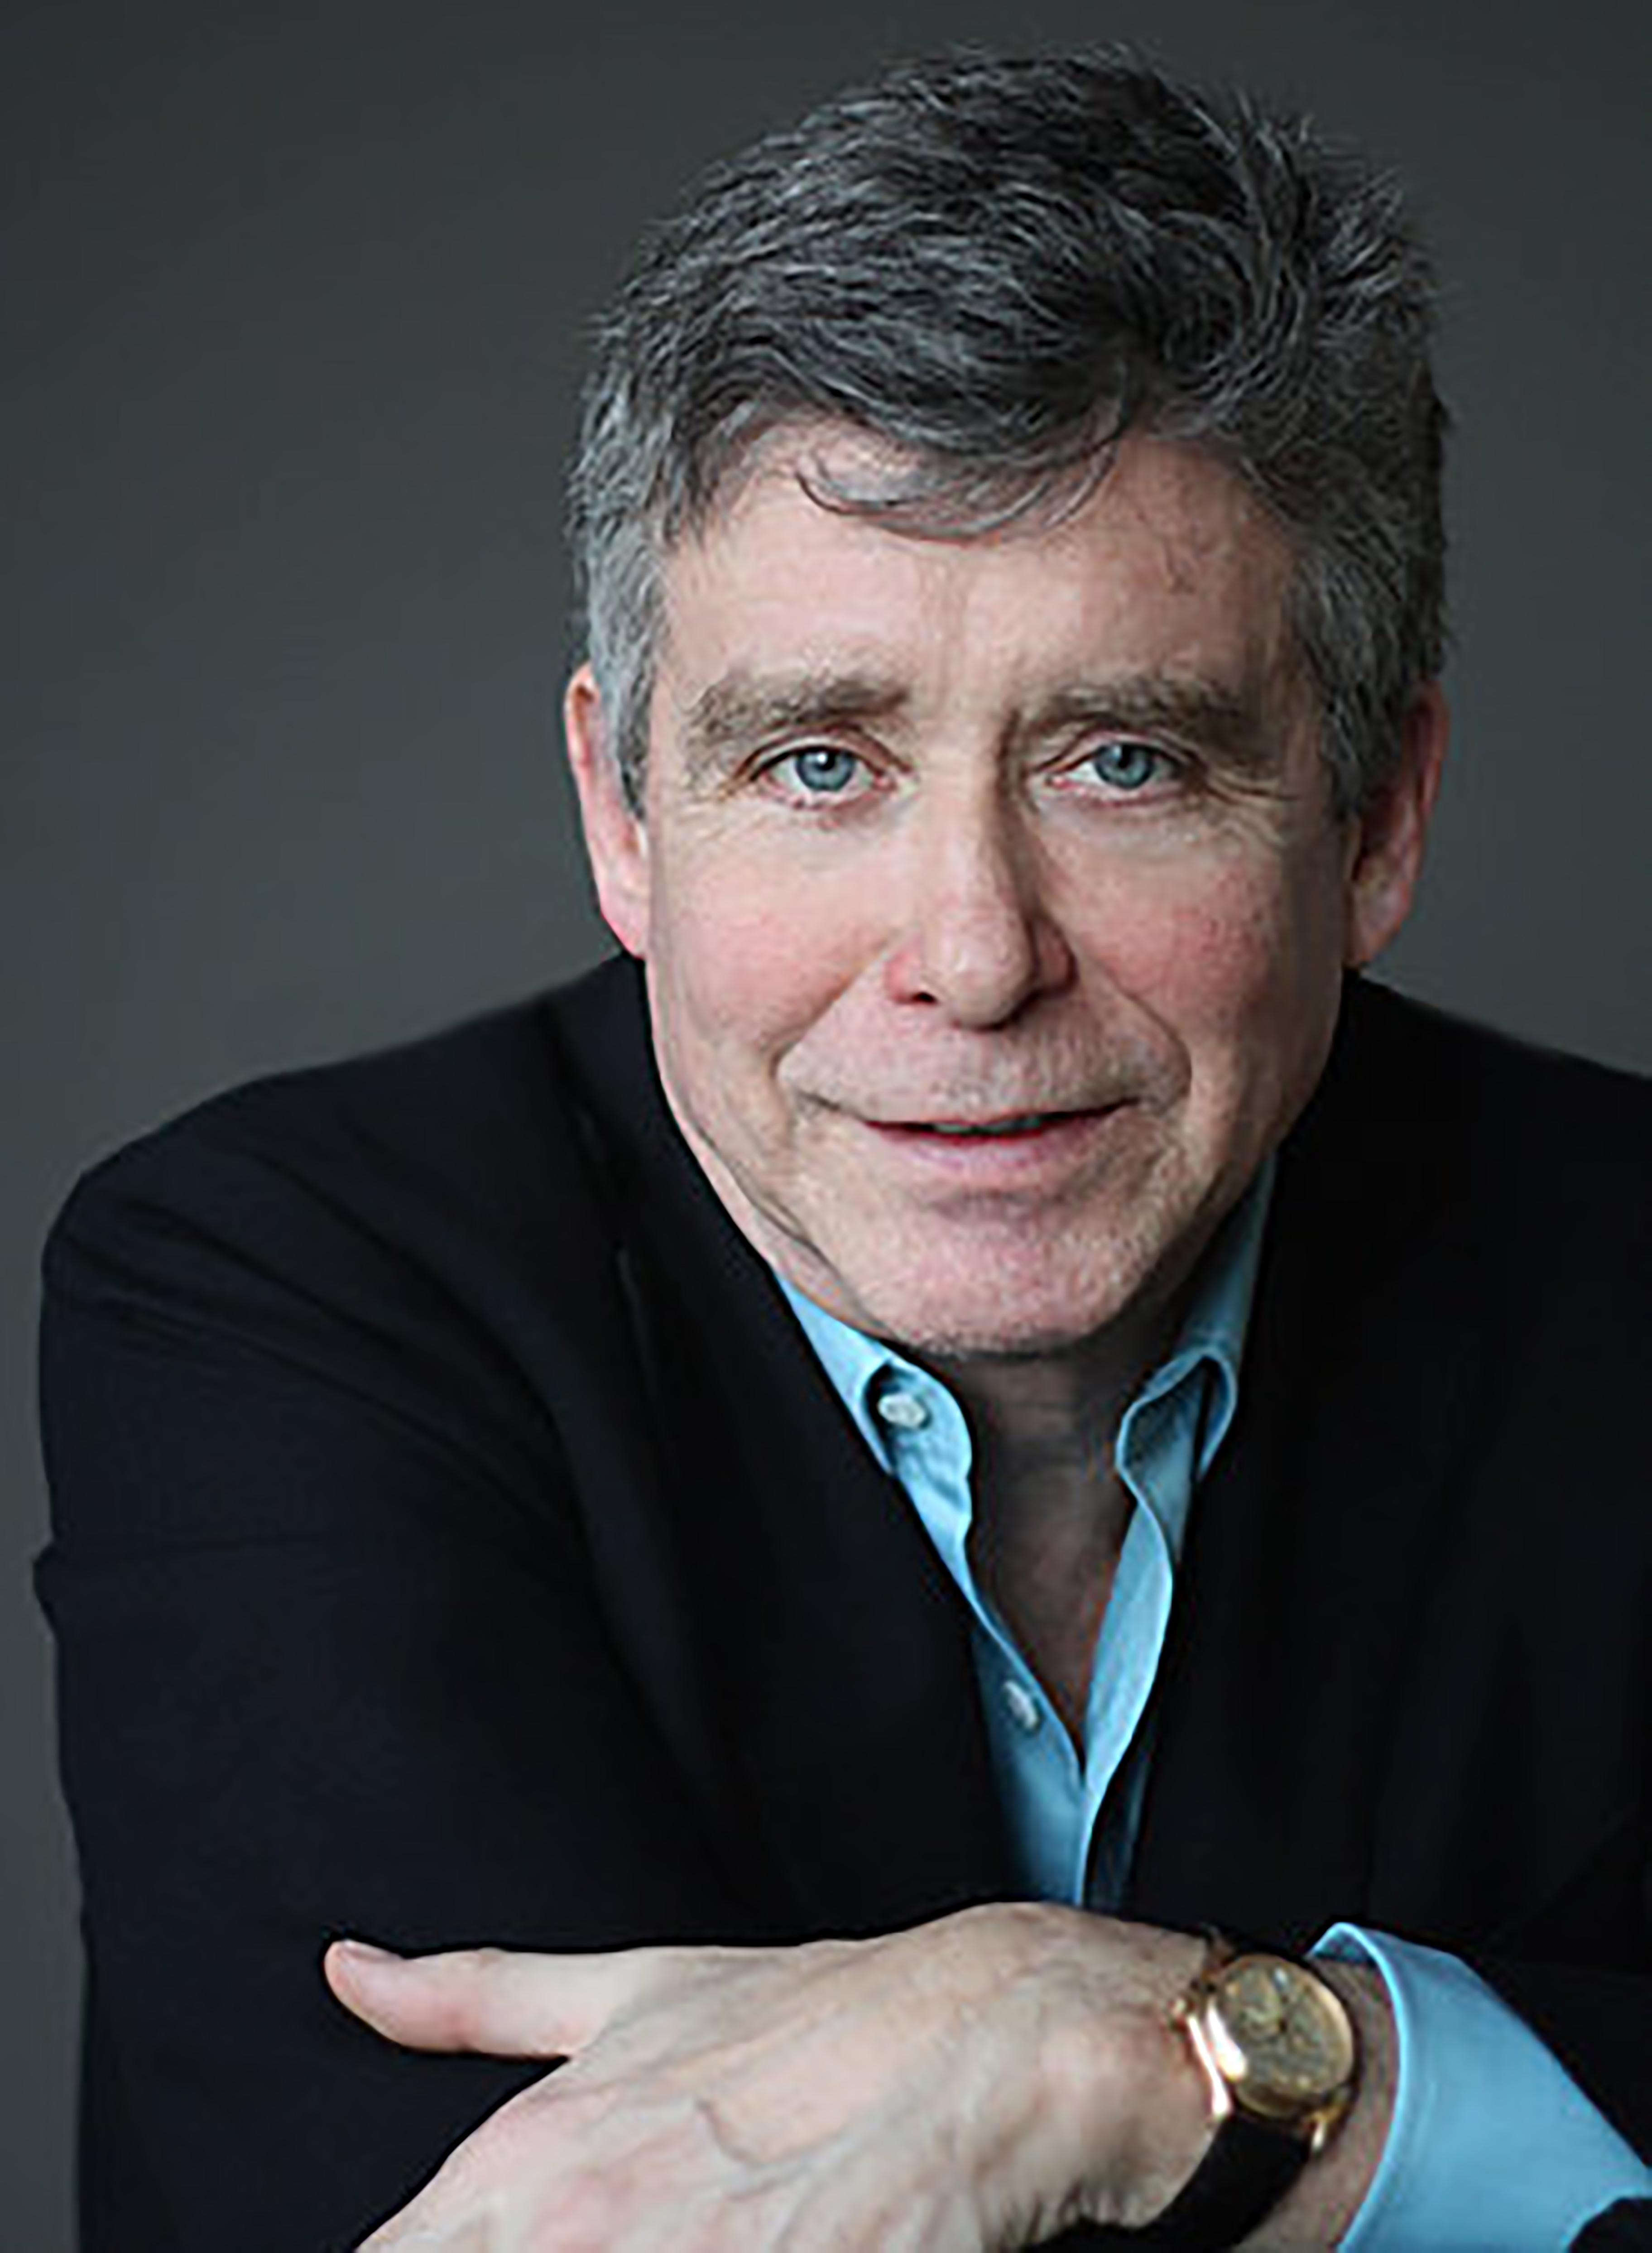 Michael Lionstar